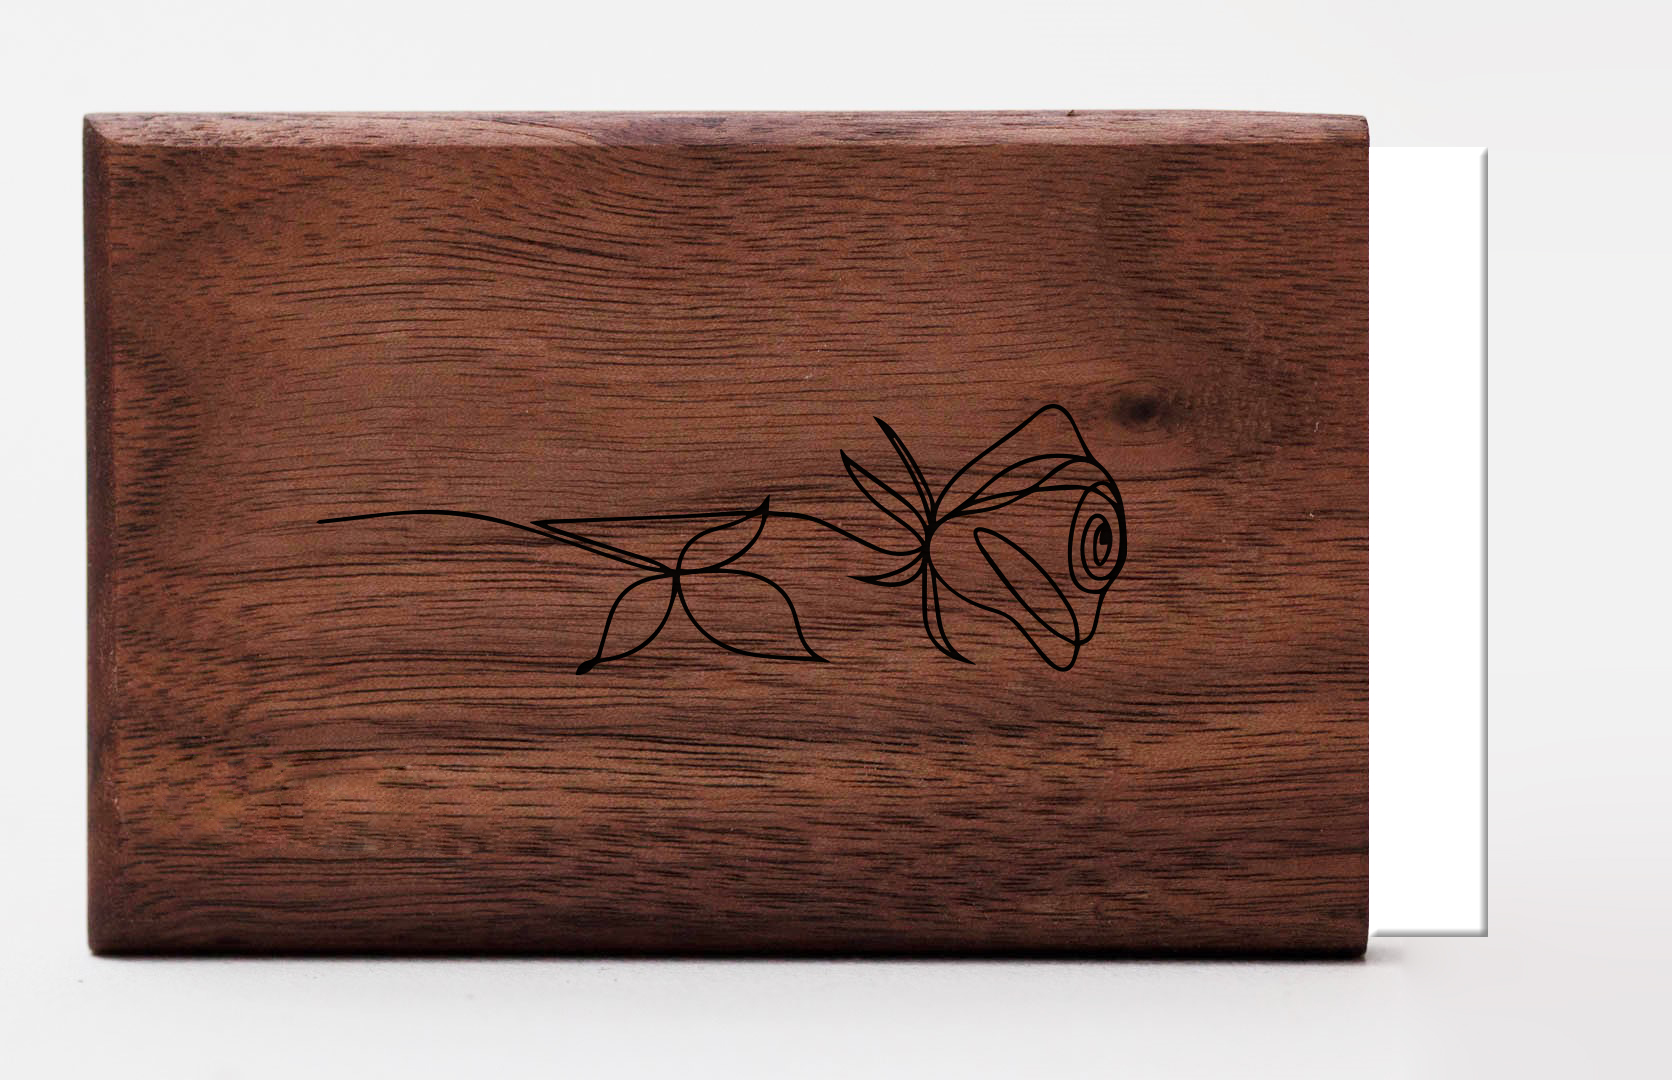 logo graveren woodlink hout personaliseren